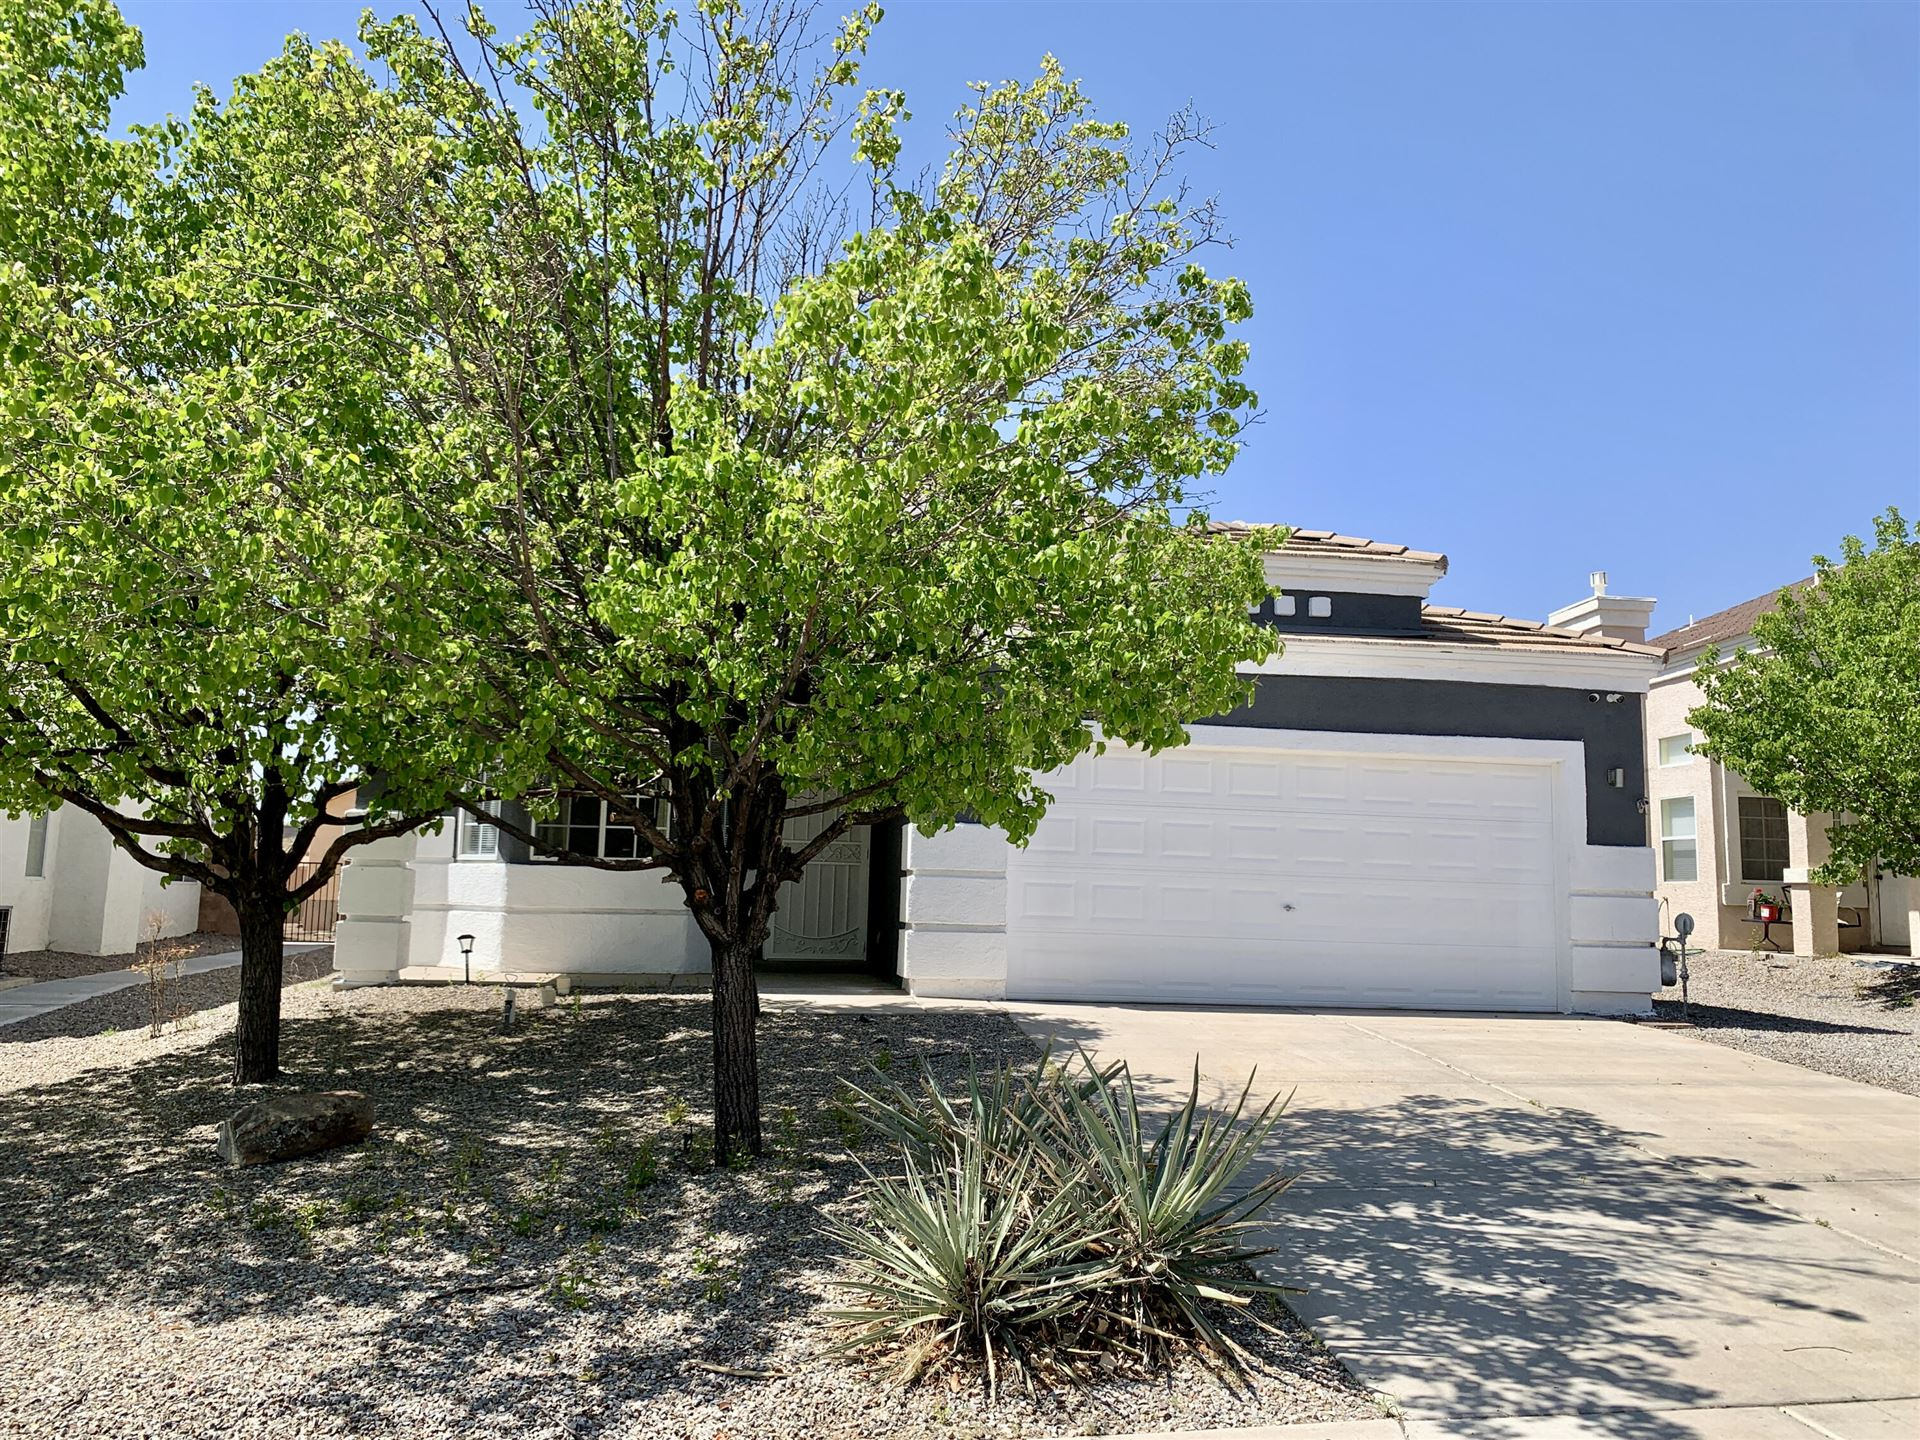 Photo of 7060 HUSKY Drive NE, Rio Rancho, NM 87144 (MLS # 989864)